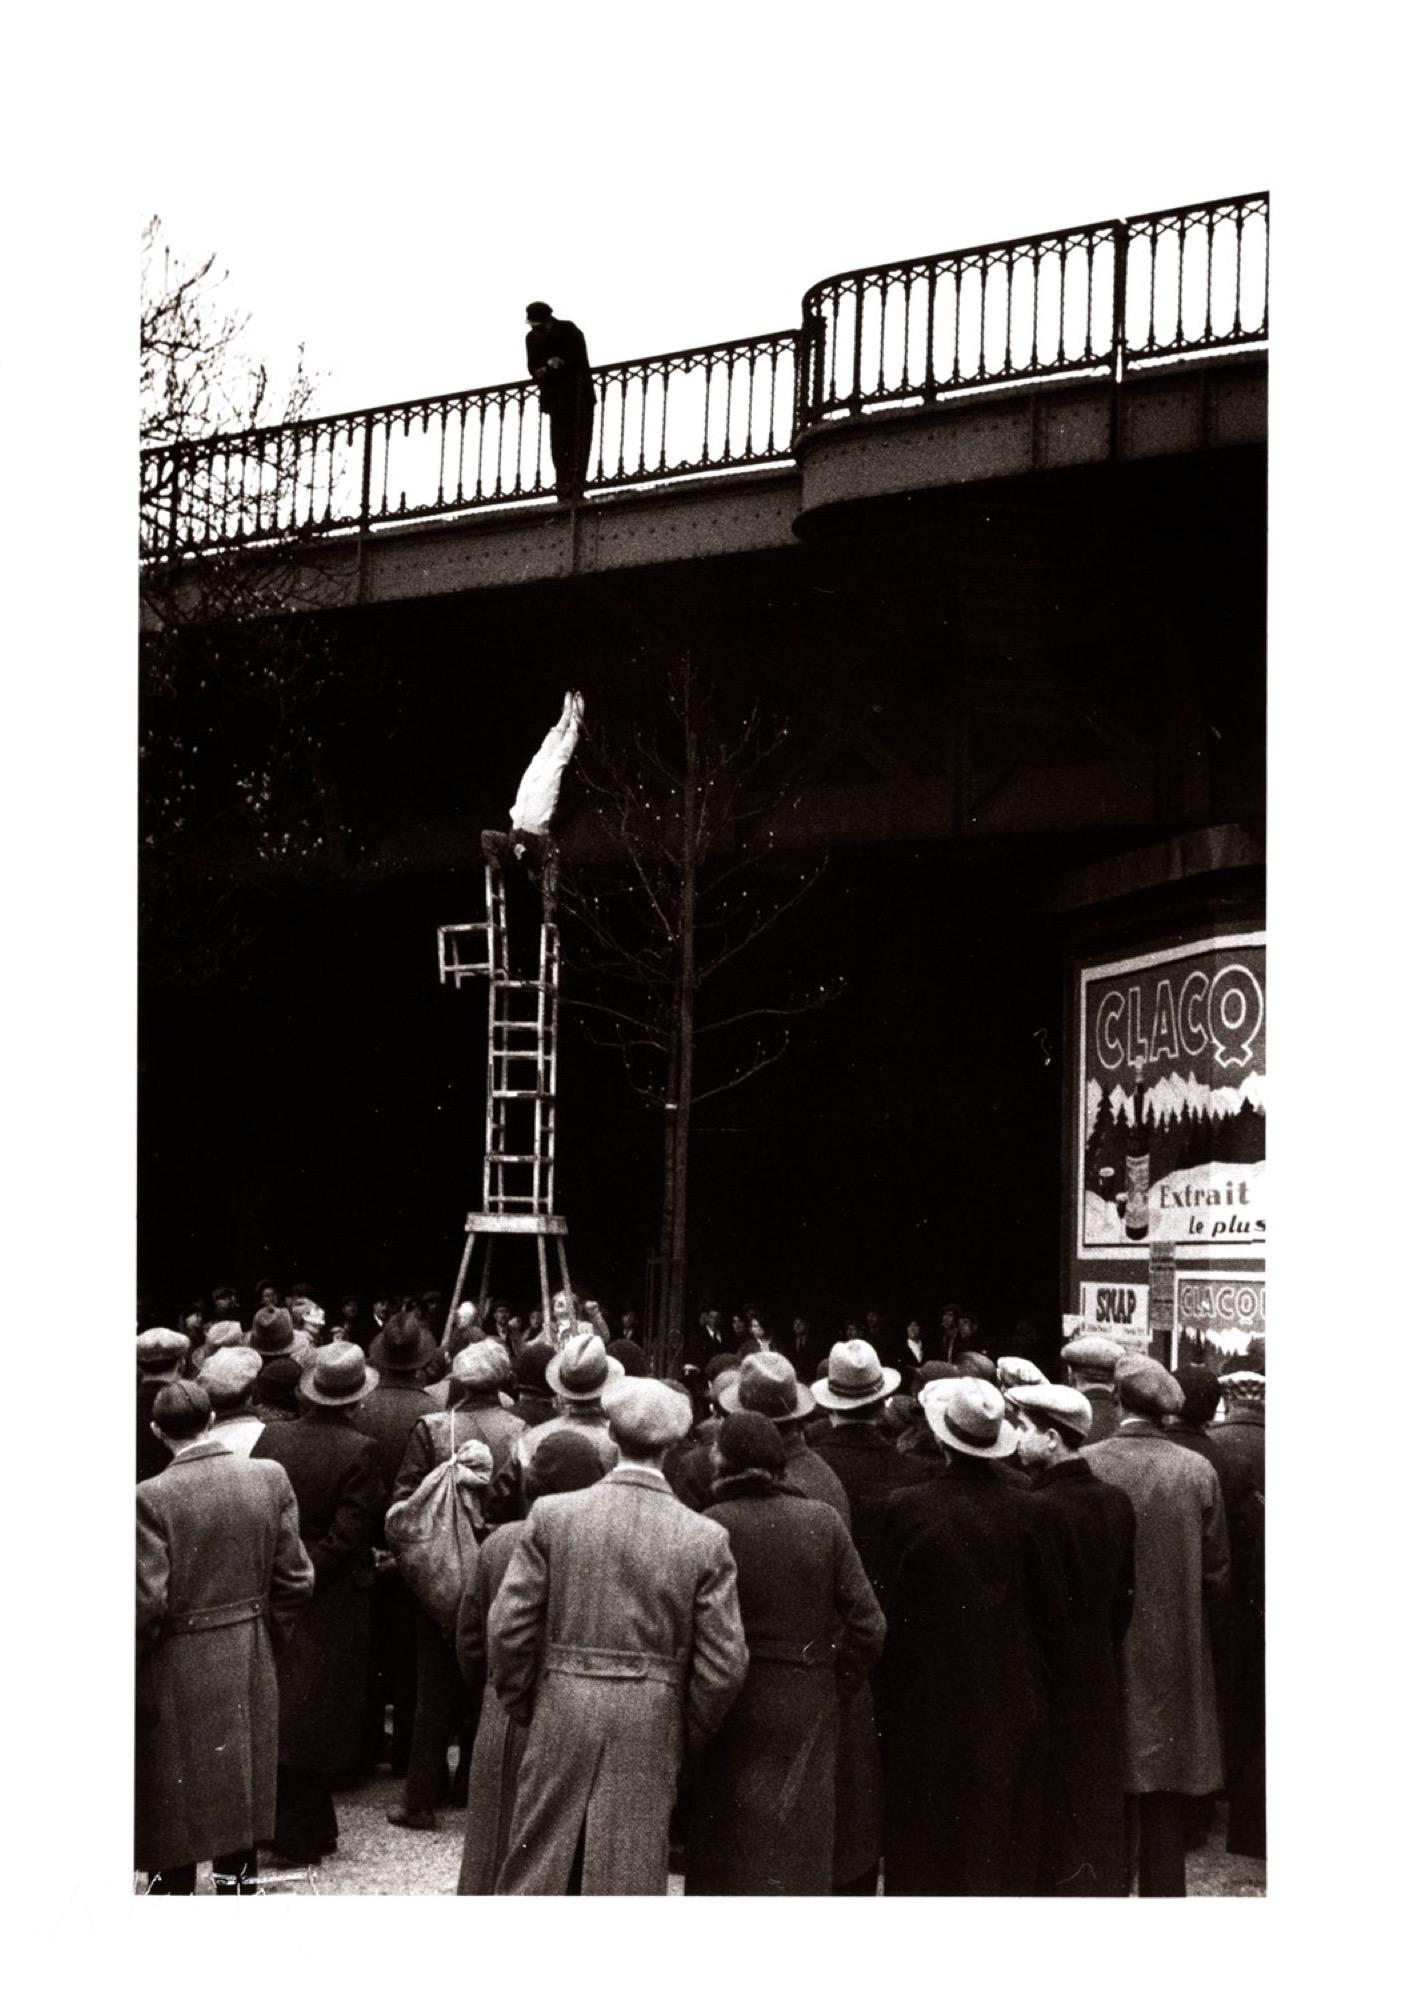 Andrè Kertèsz (1894-1985) - Equilibriste, years 1930 - Gelatin silver print, [...]